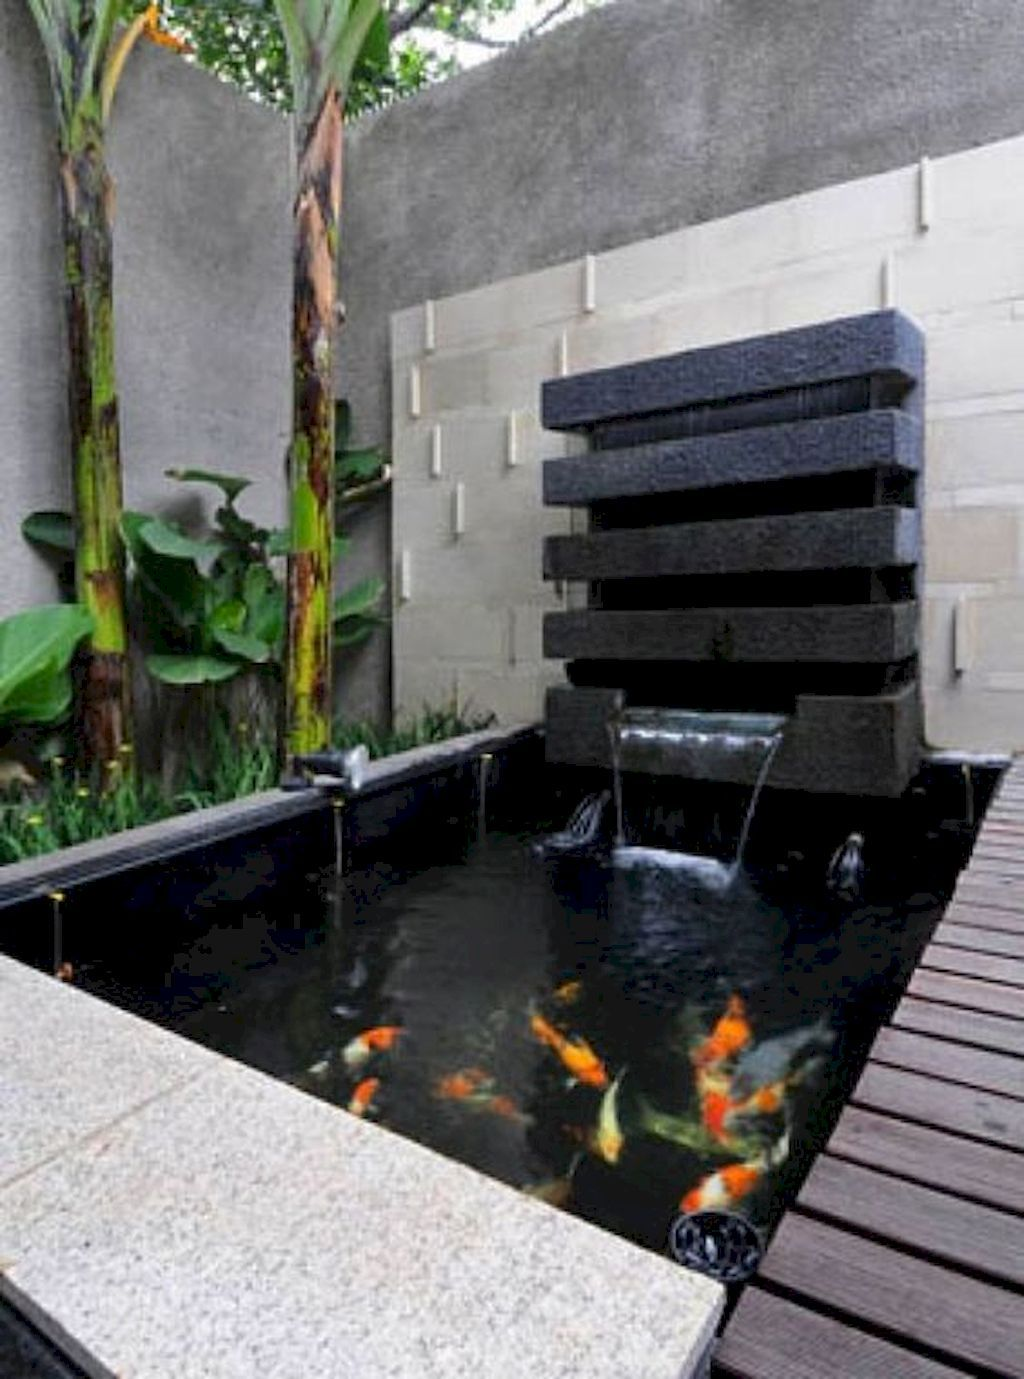 55 Most Popular Pond And Water Garden Ideas For Beautiful Backyard Pond Design Indoor Pond Ponds Backyard